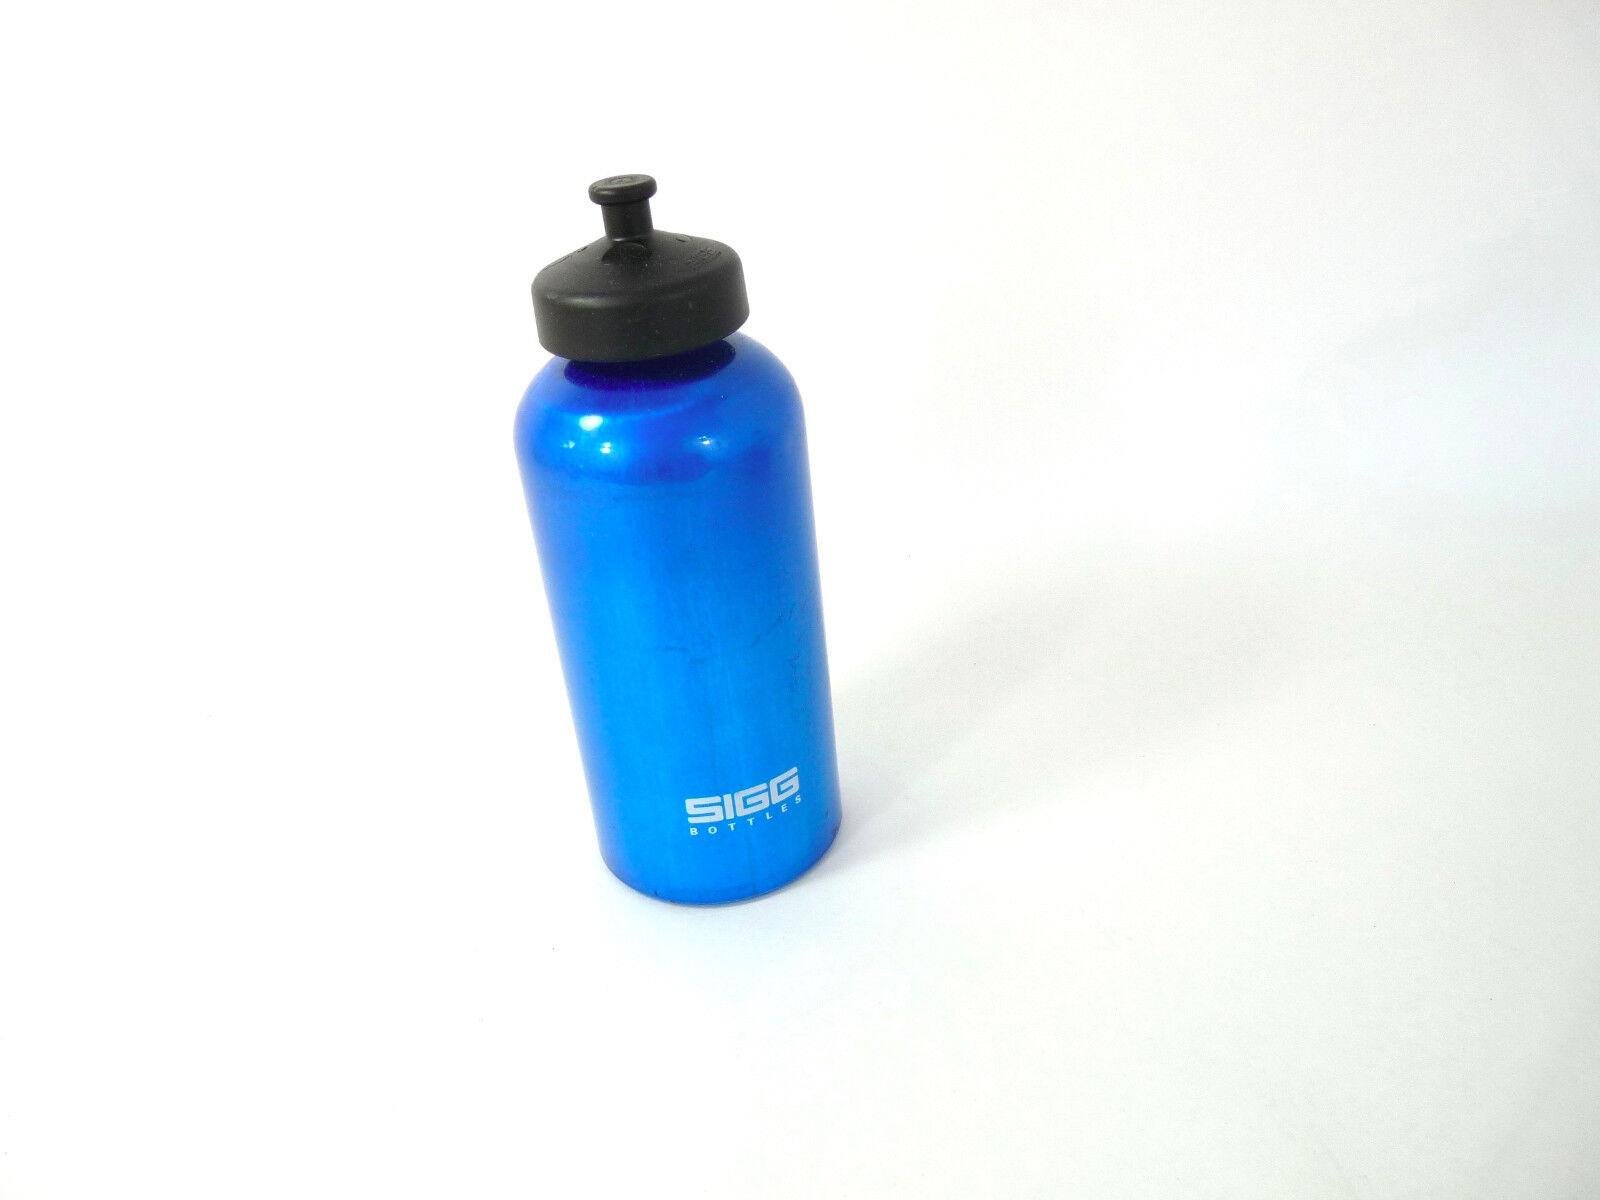 SIGG metal Water Bottle bluee Swiss  Made Vintage Road Bike NOS  best reputation